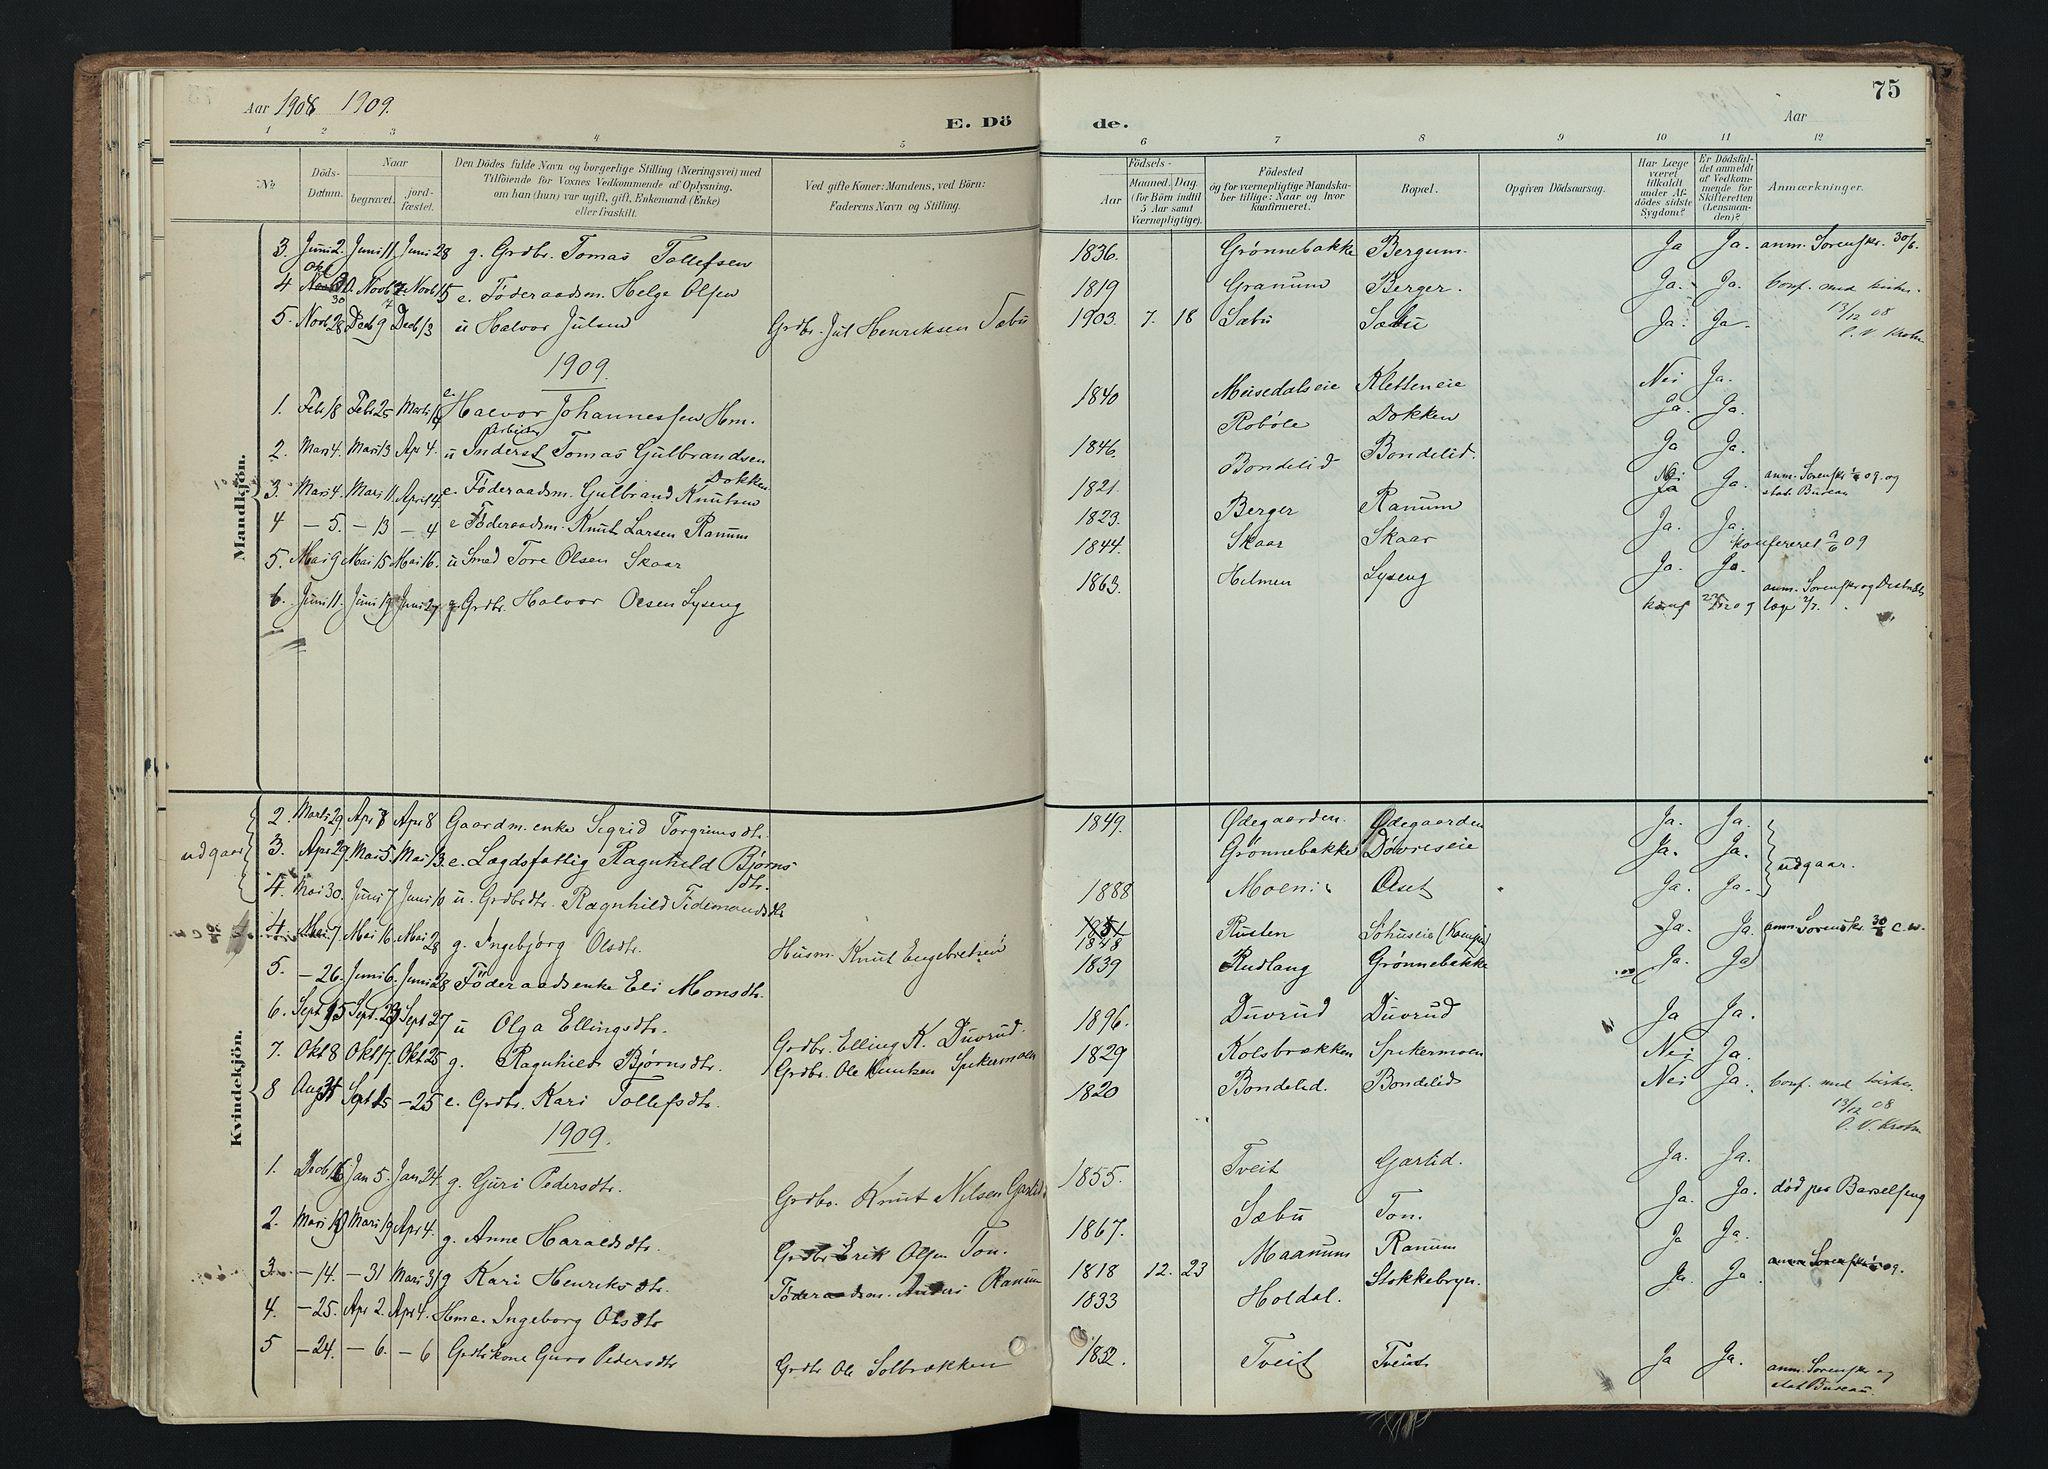 SAH, Nord-Aurdal prestekontor, Ministerialbok nr. 15, 1896-1914, s. 75